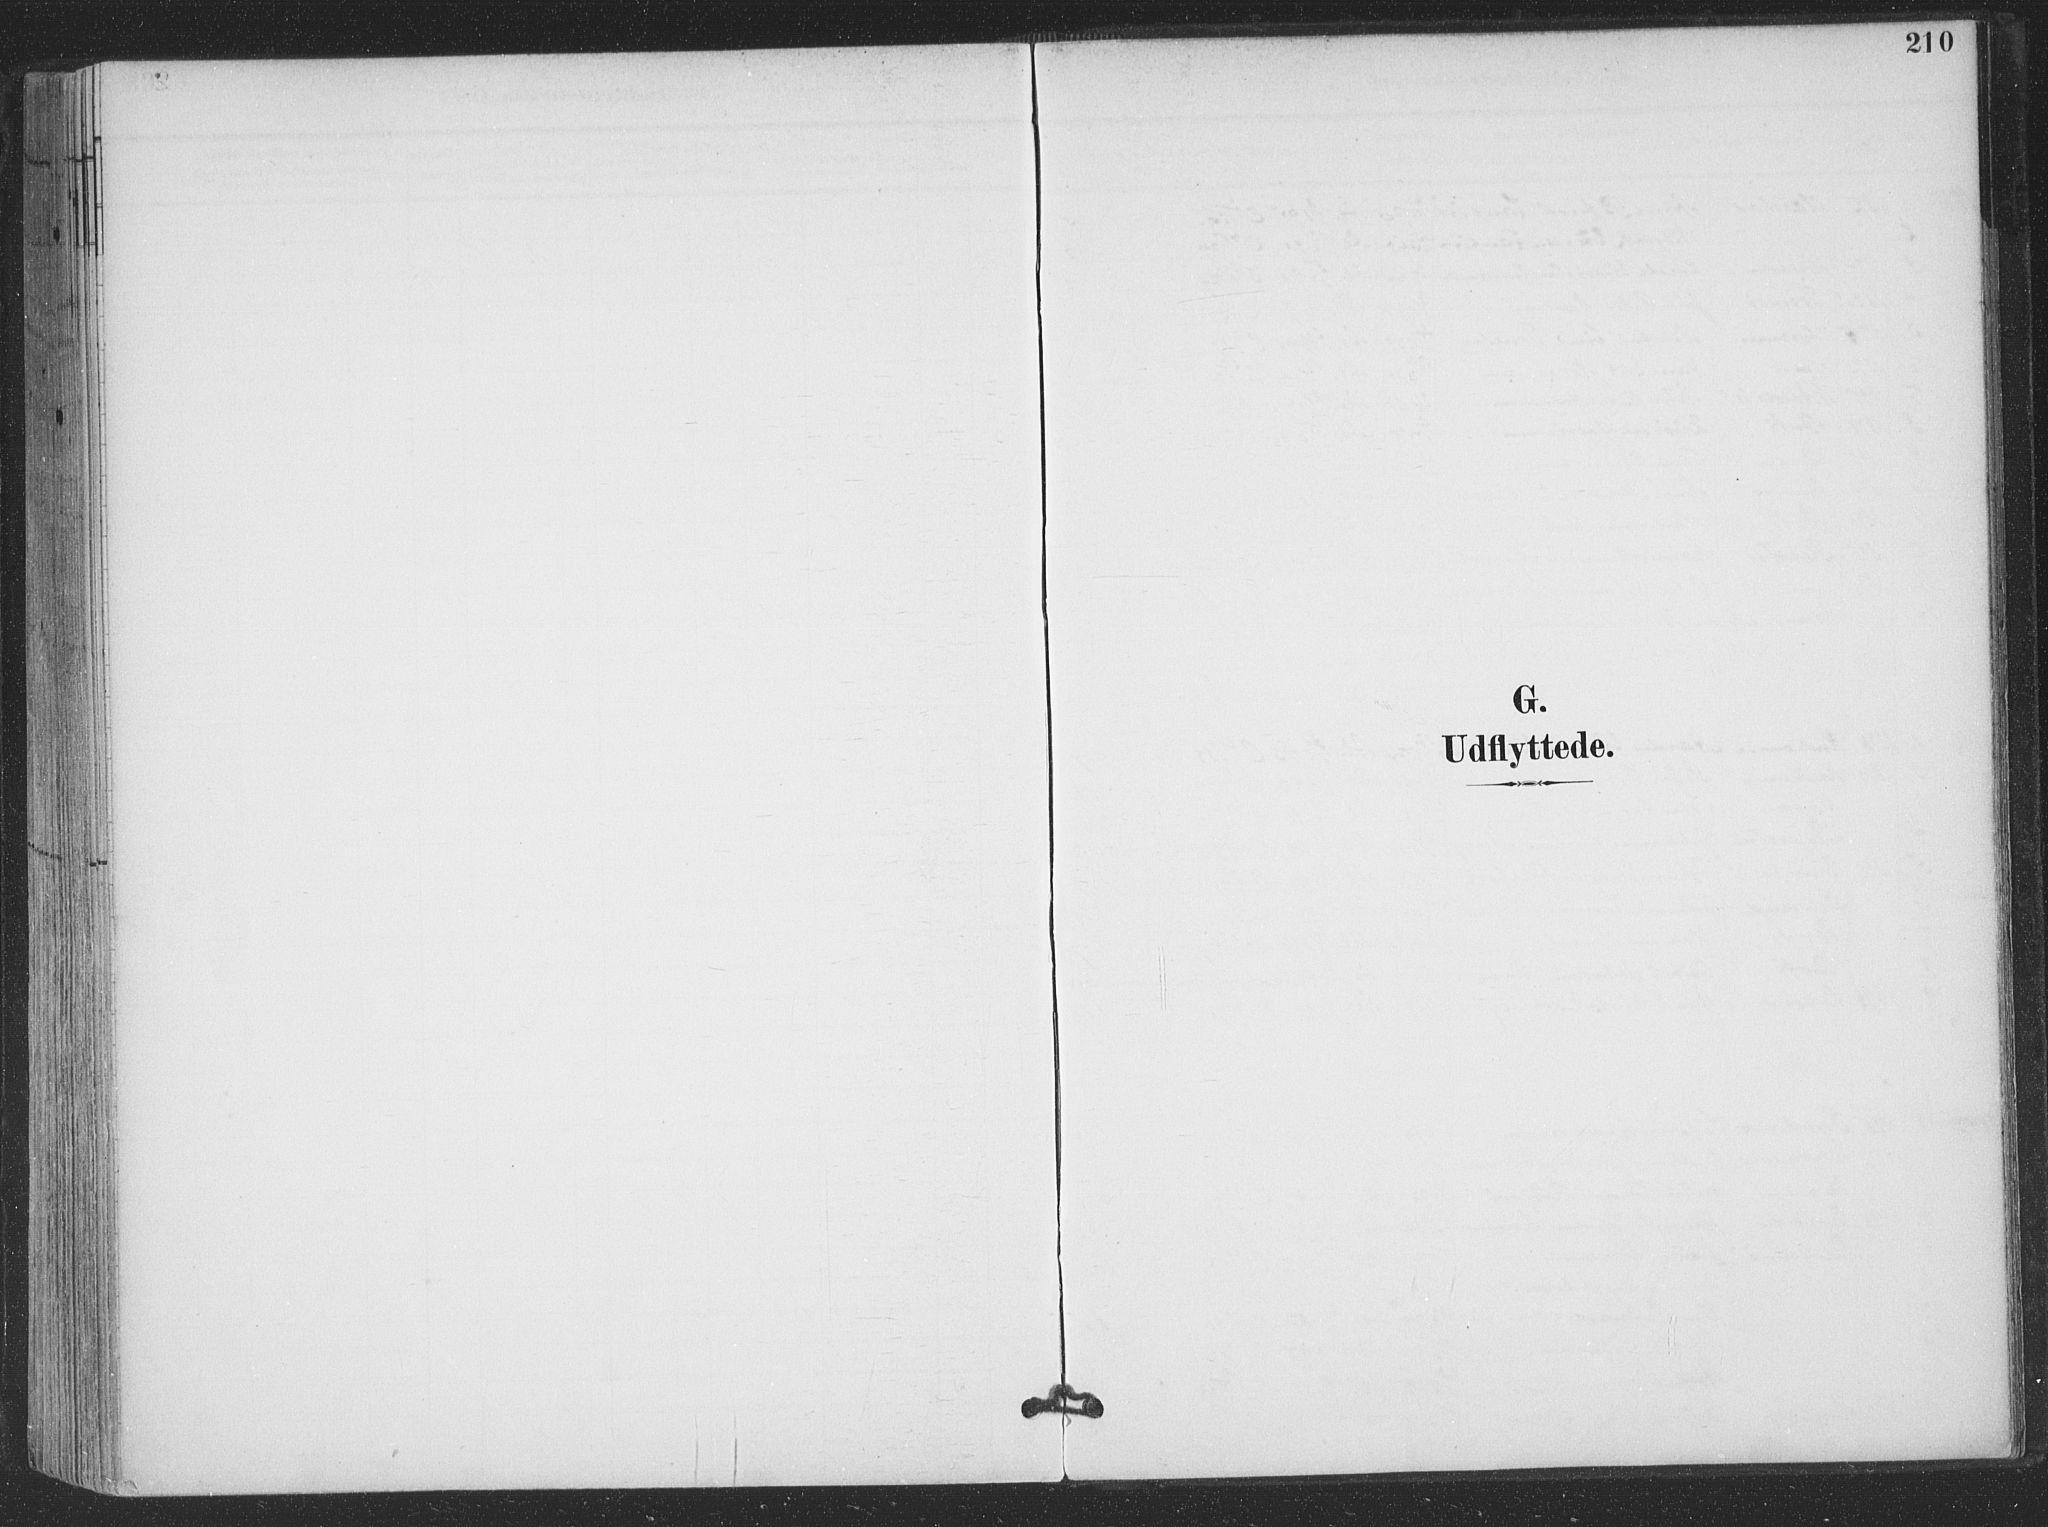 SAT, Ministerialprotokoller, klokkerbøker og fødselsregistre - Nordland, 866/L0939: Ministerialbok nr. 866A02, 1894-1906, s. 210